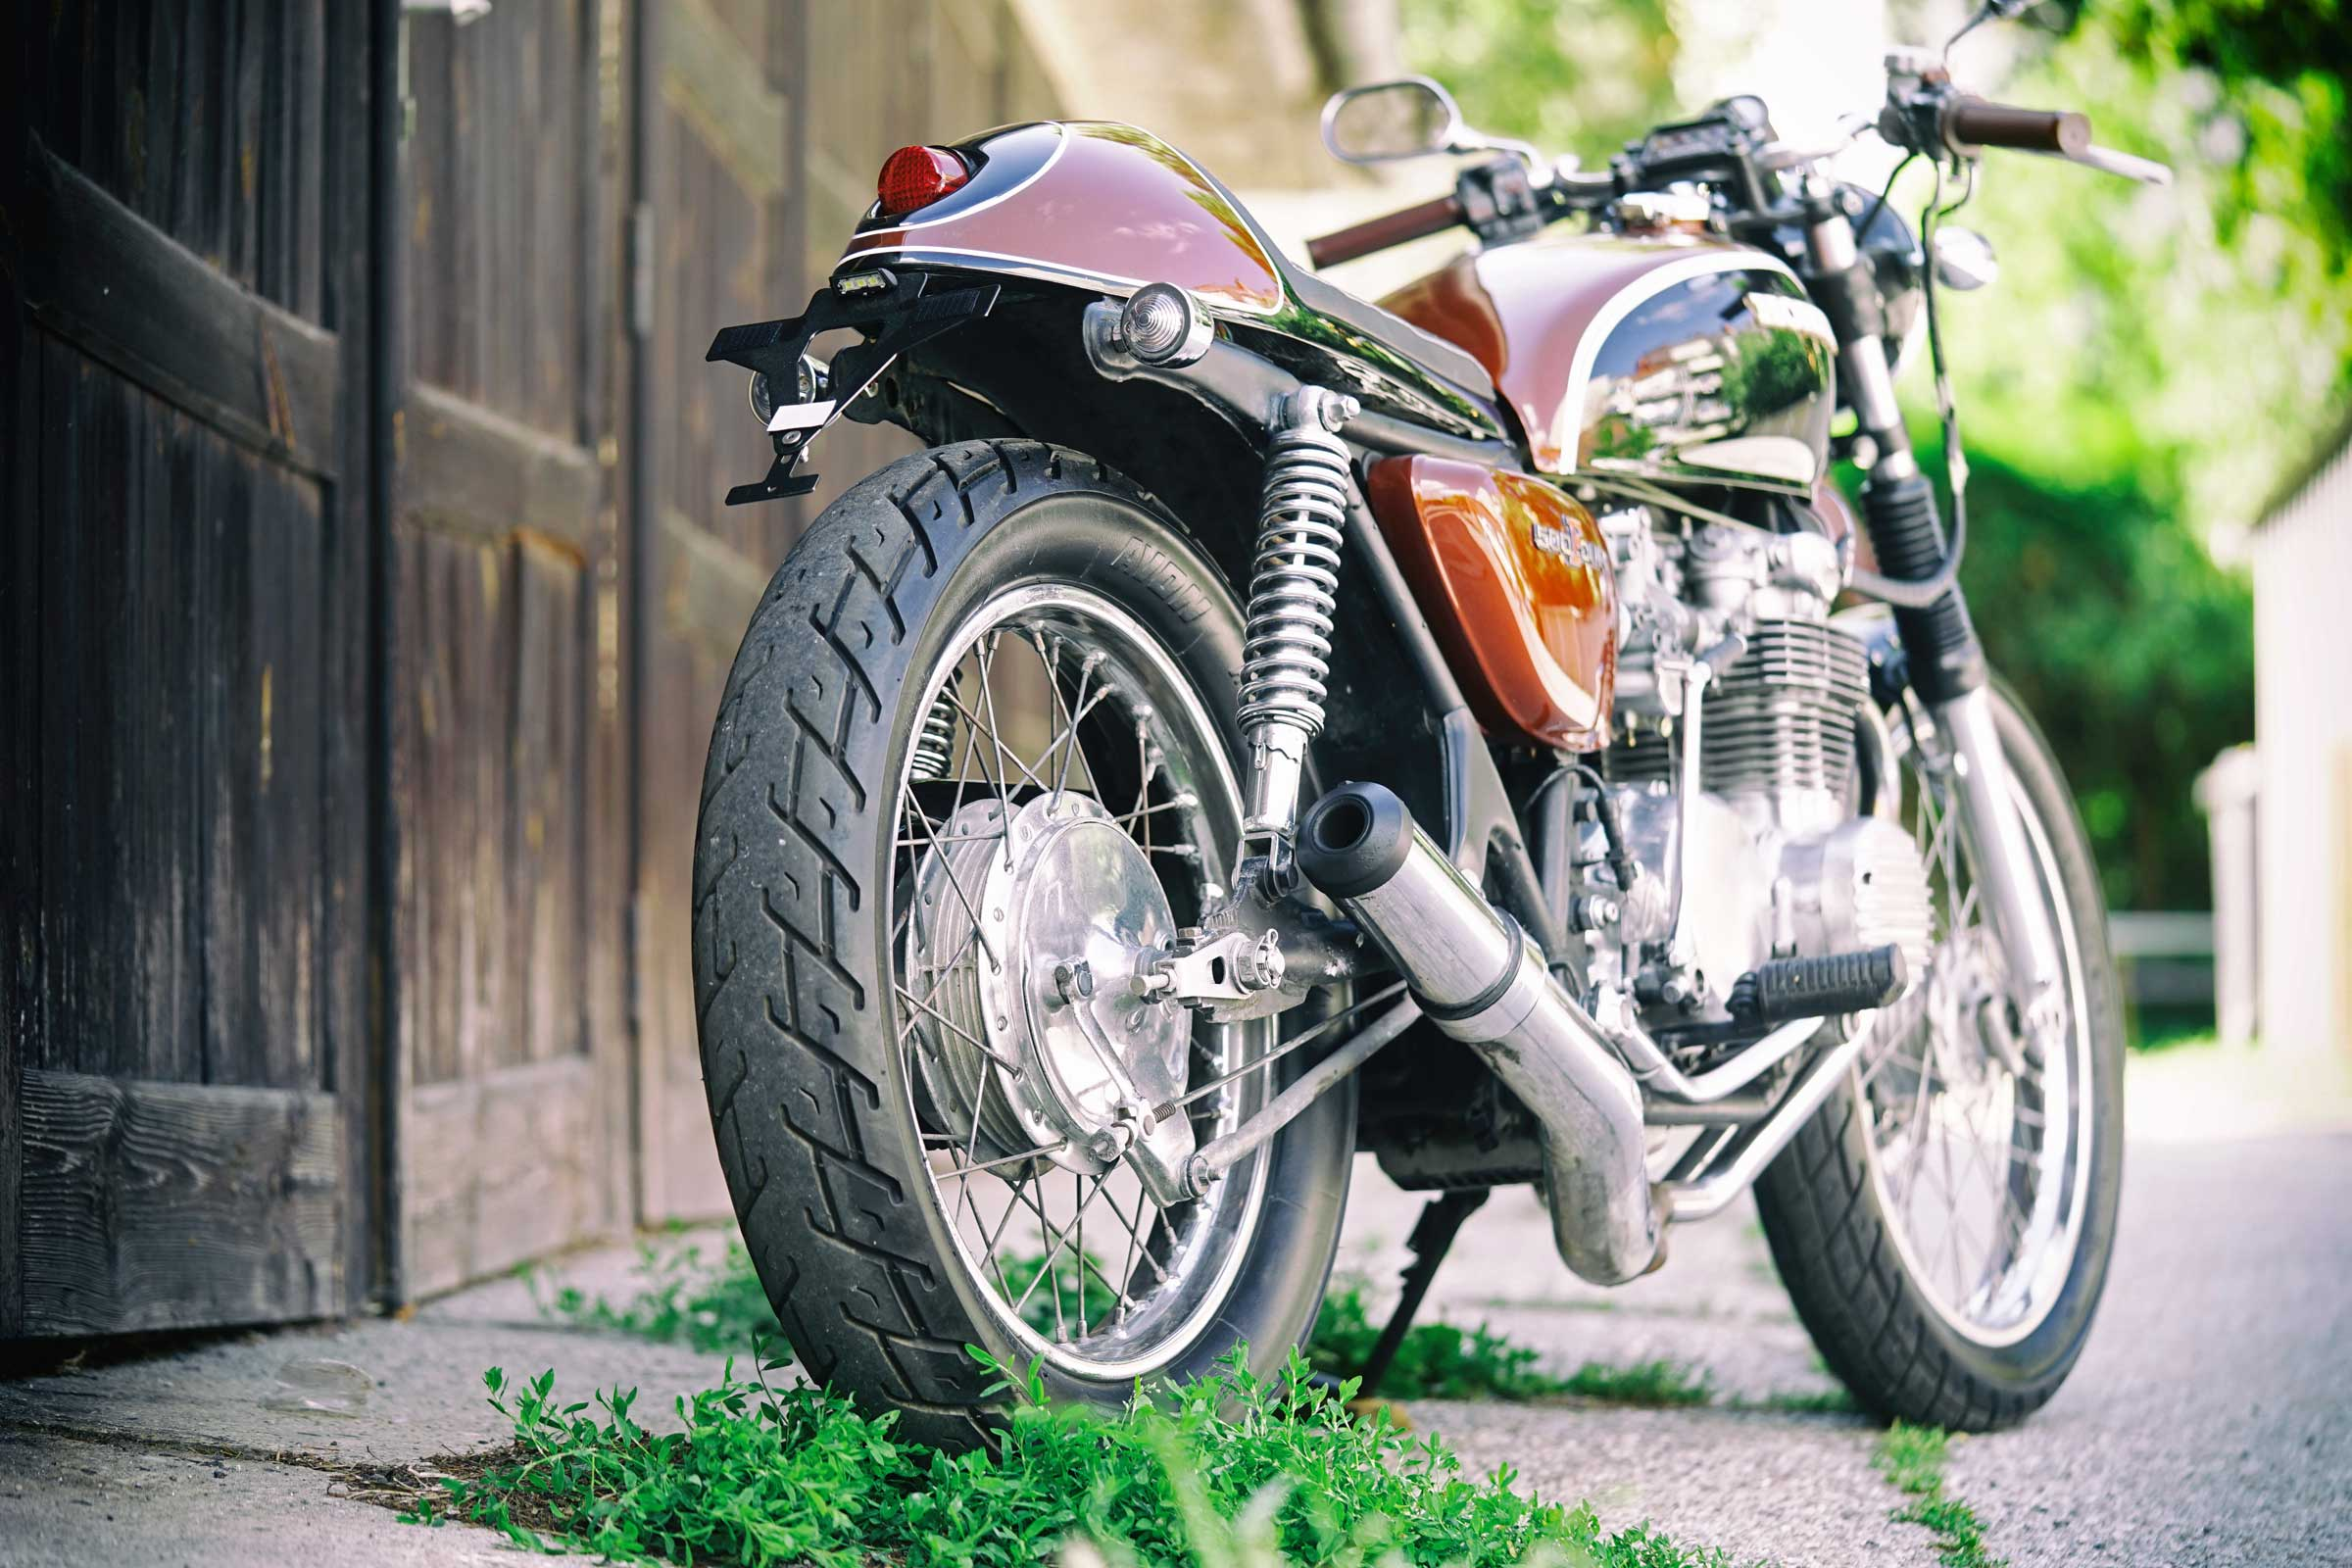 Titan-Sakura-Honda-CB-500-Four-Umbau-Classic-Cafe-Racer-Vierzylinder-Custom-Bikes-Graz-(8)